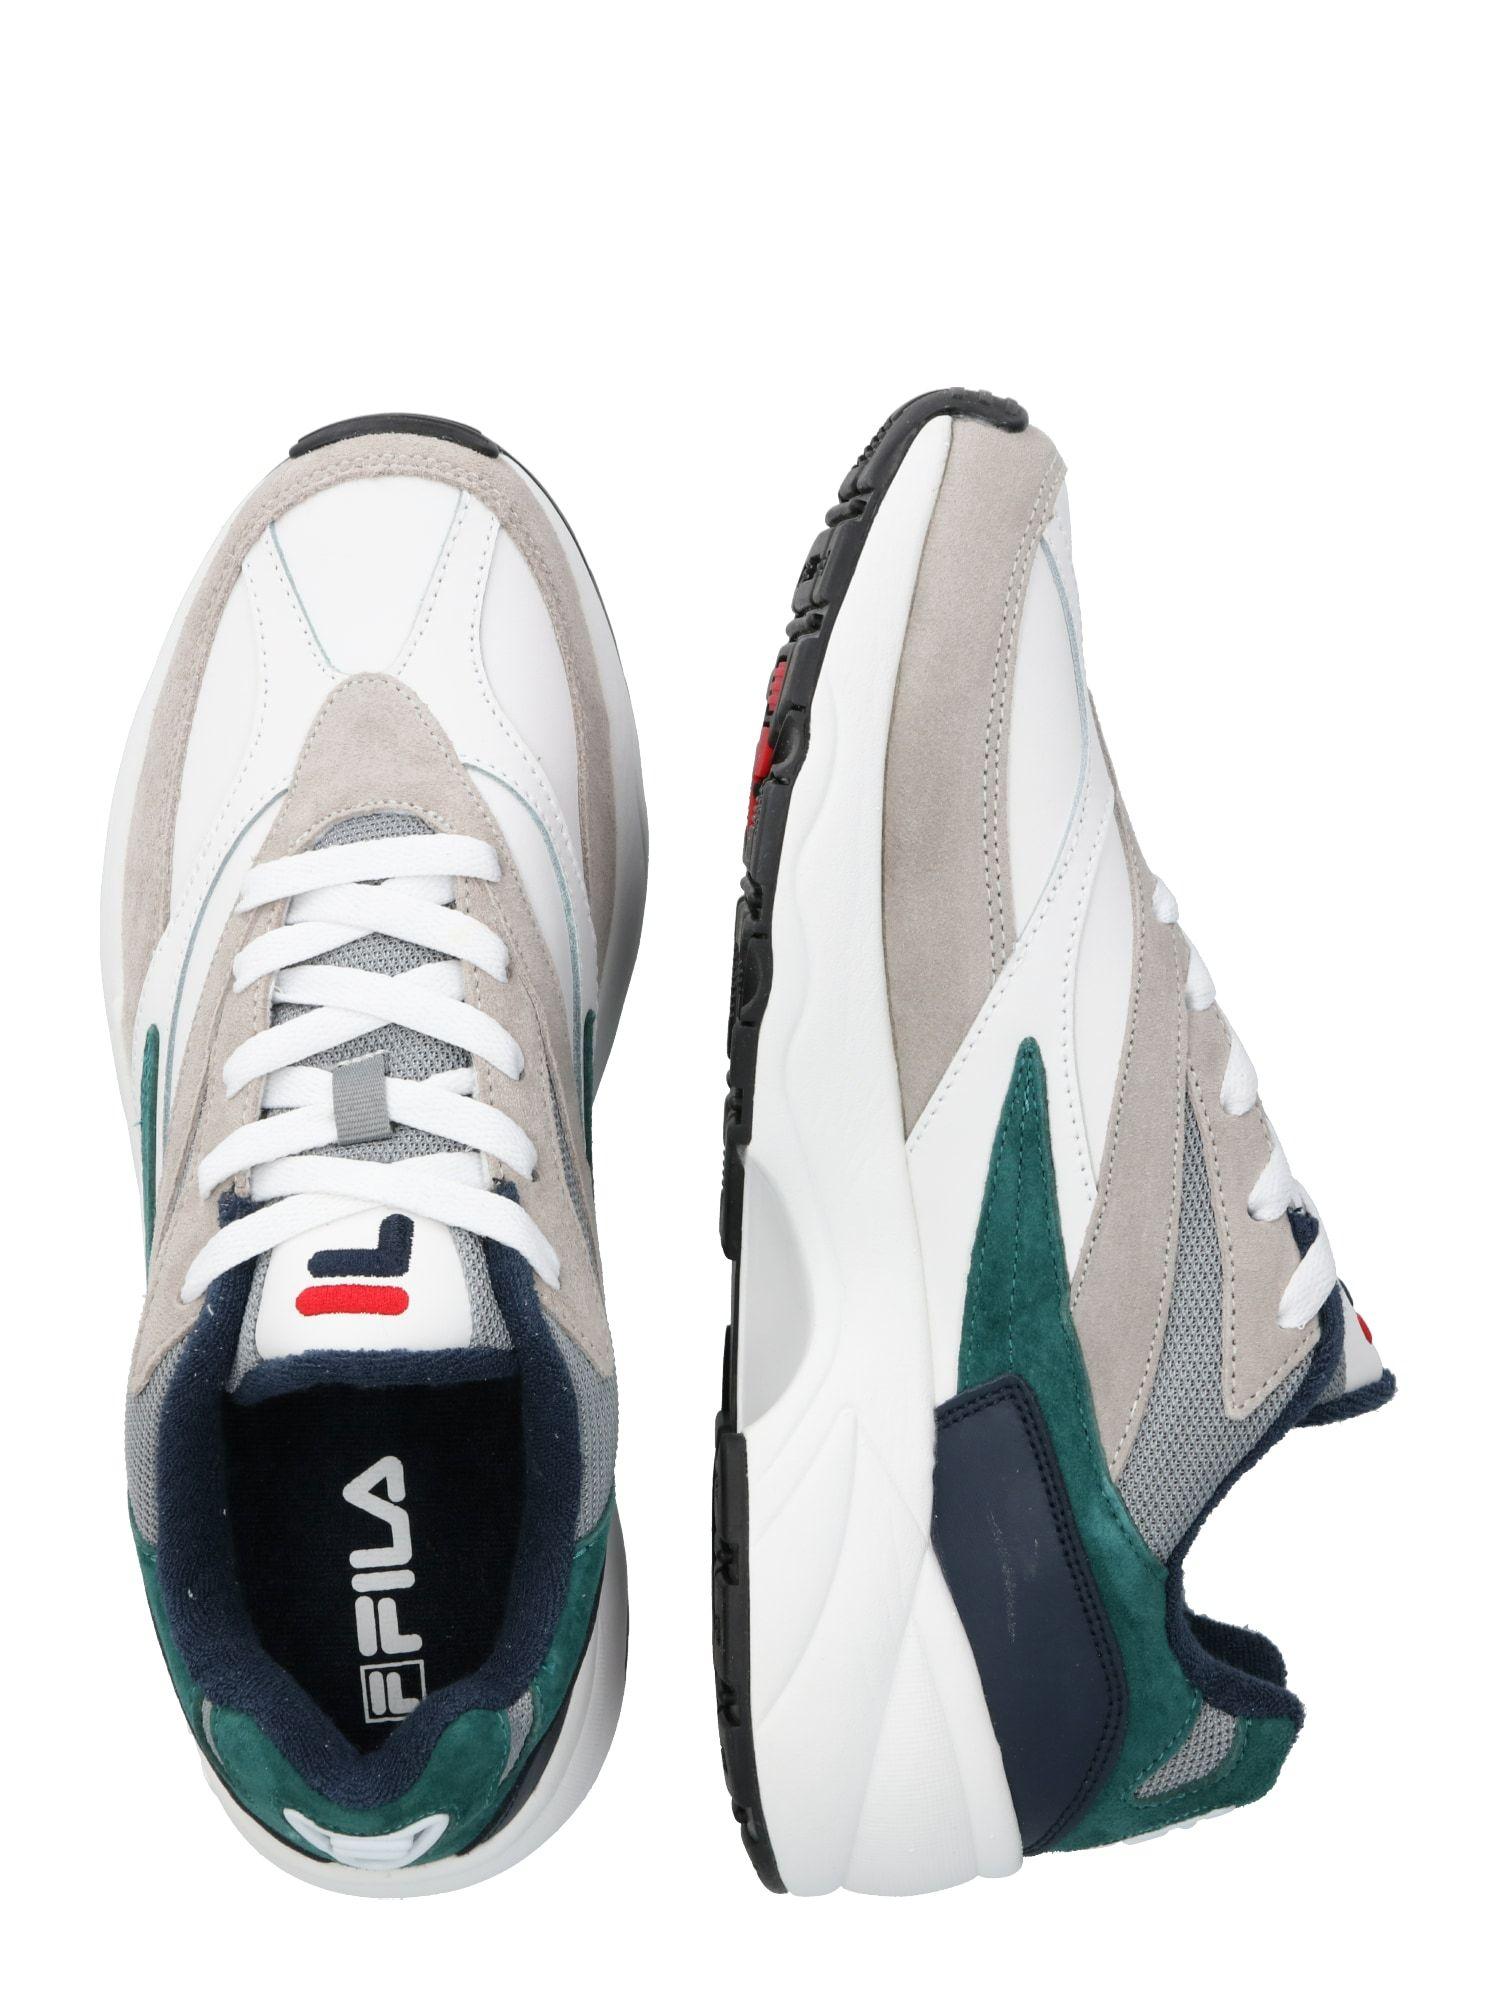 FILA Sneaker 'V94M L low' Herren, Dunkelblau Grau Grün